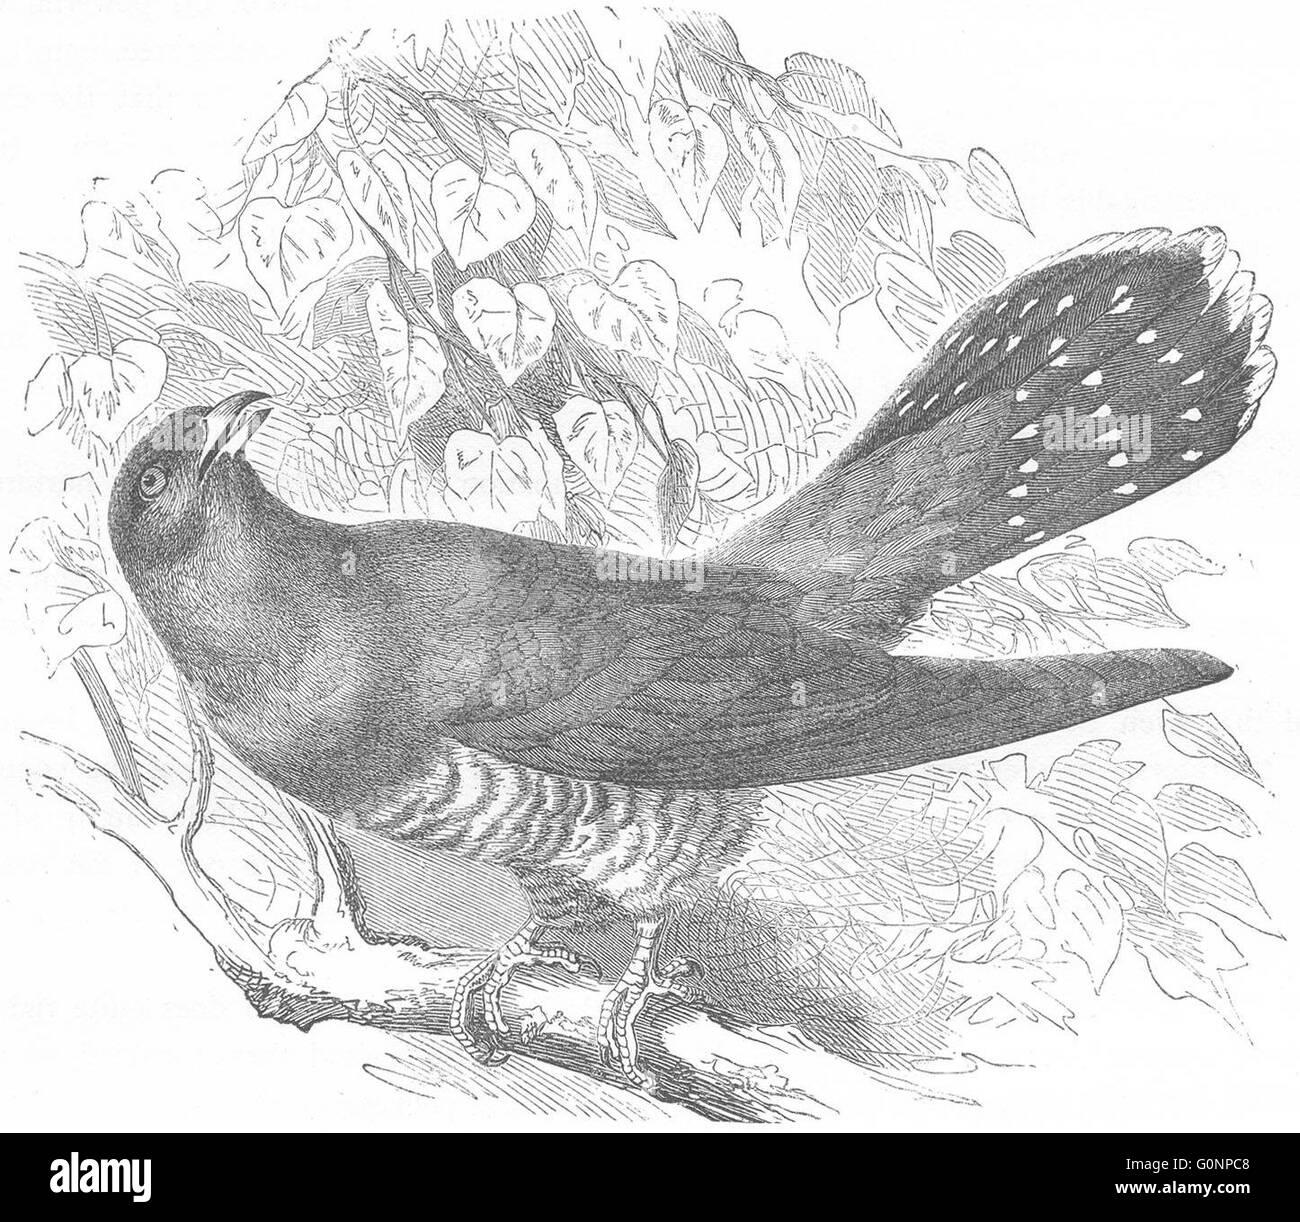 BIRDS: Searcher: Cuckoo, antique print c1870 - Stock Image